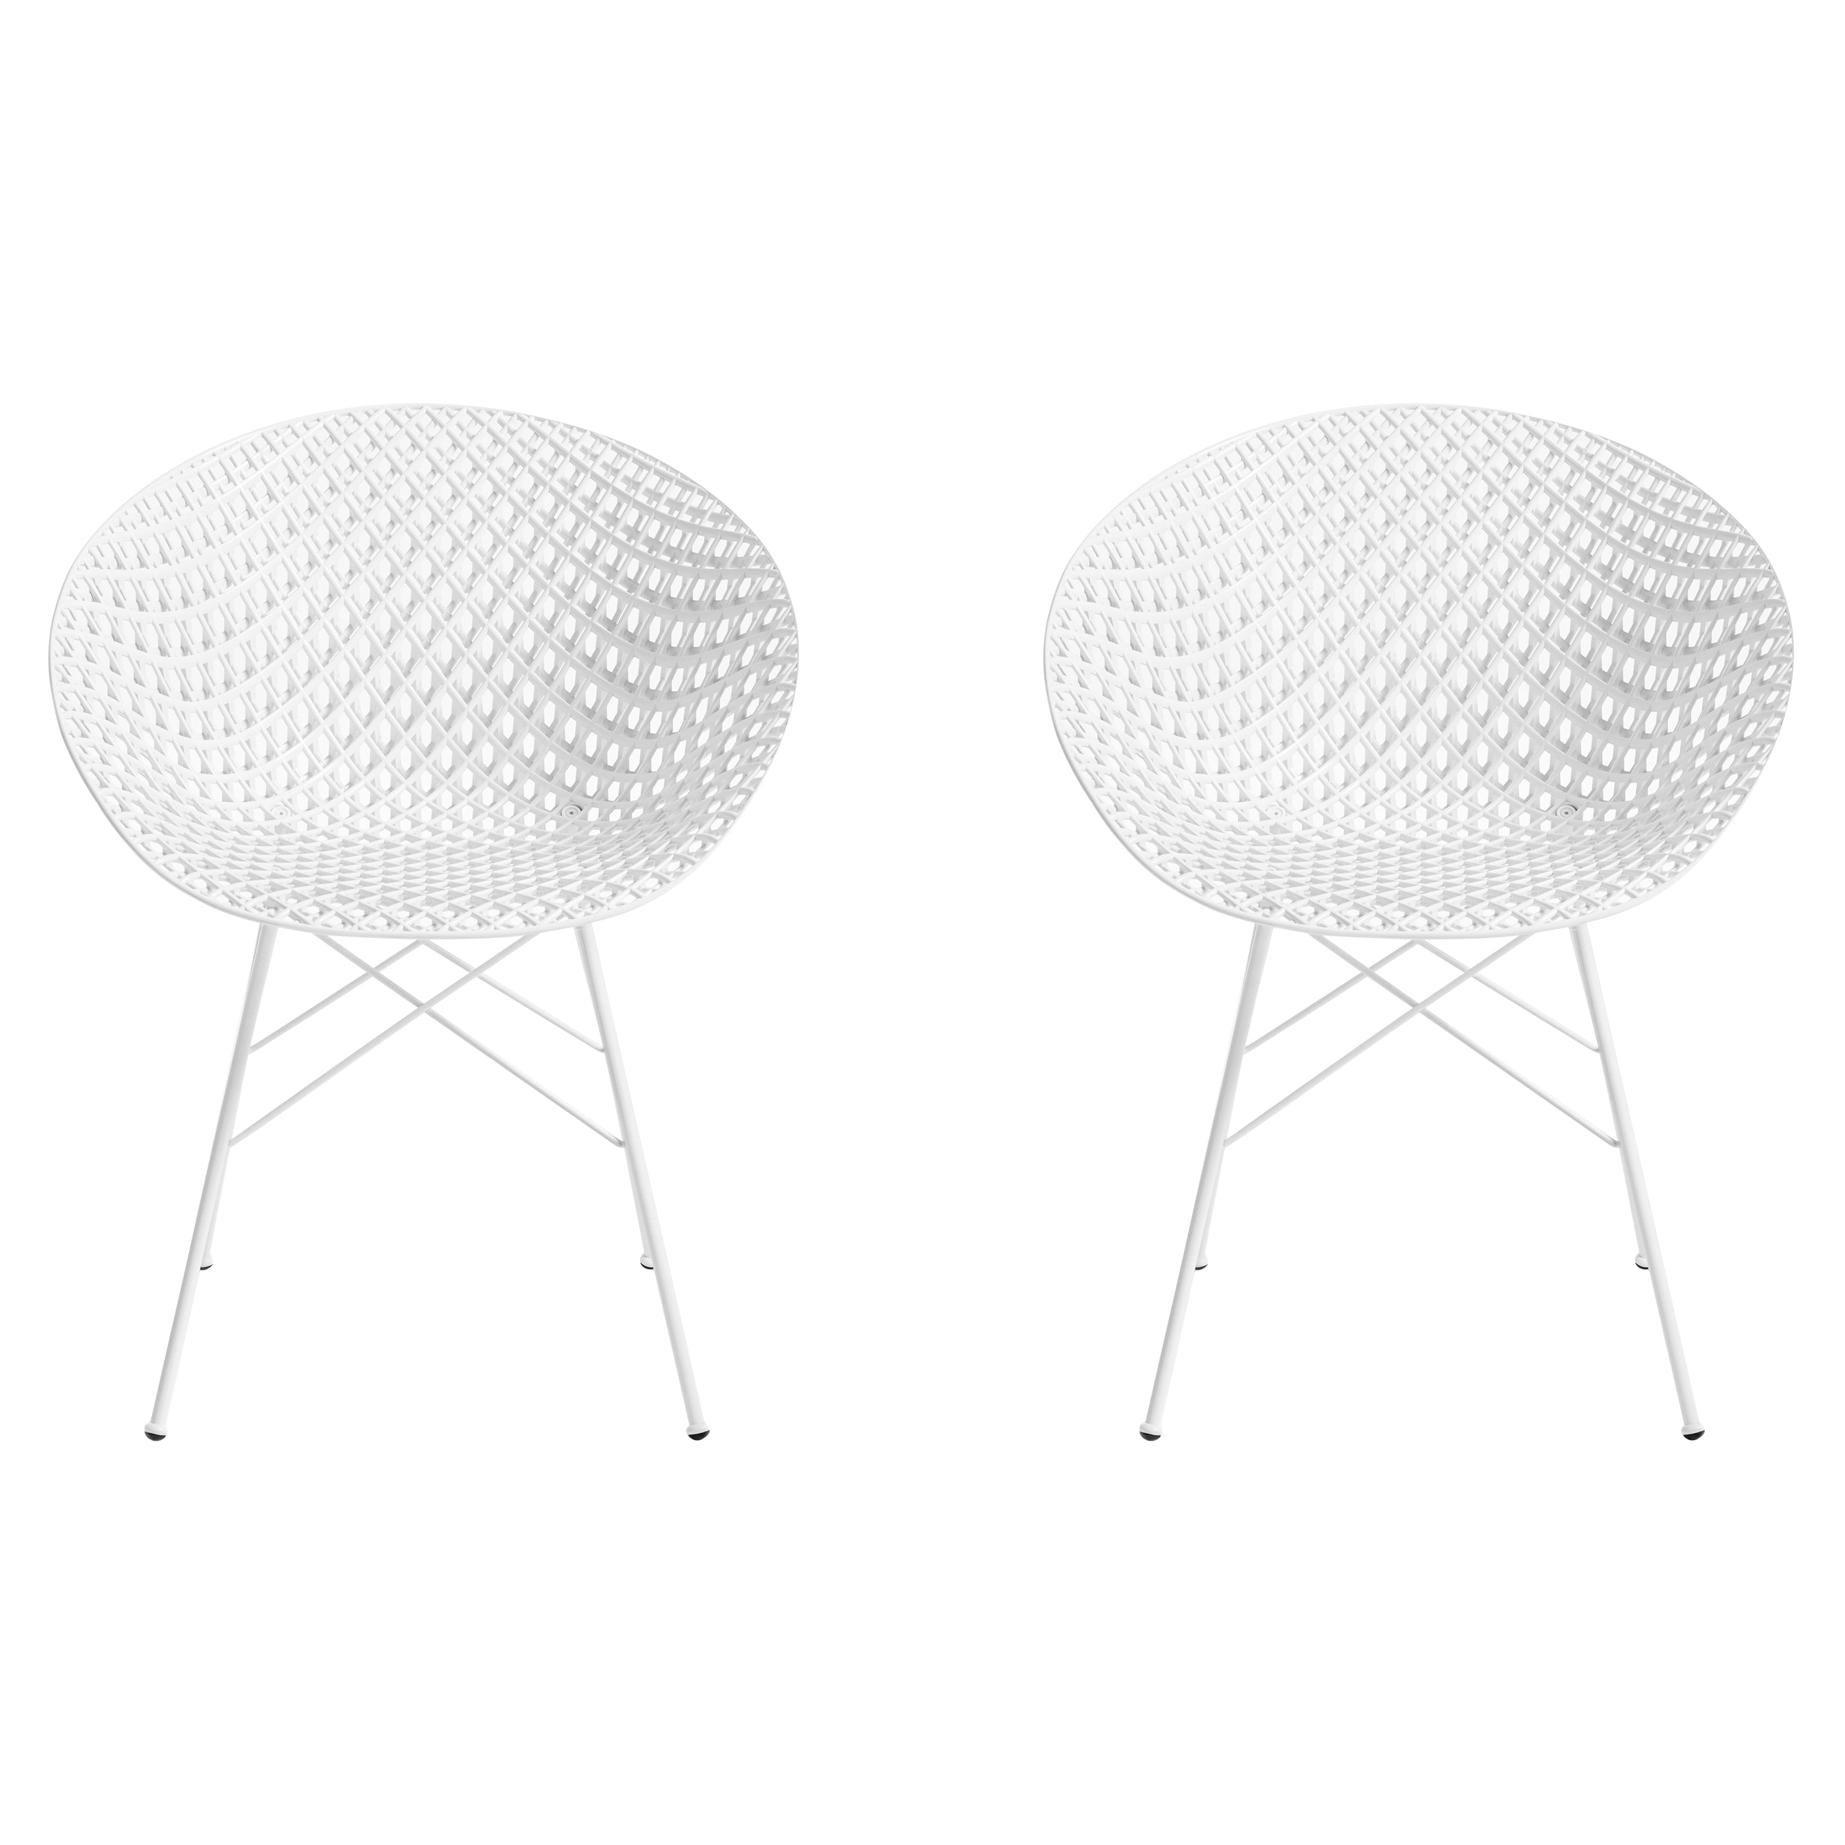 Set of 2 Kartell Smatrik Chair in White with White Legs by Tokujin Yoshioka